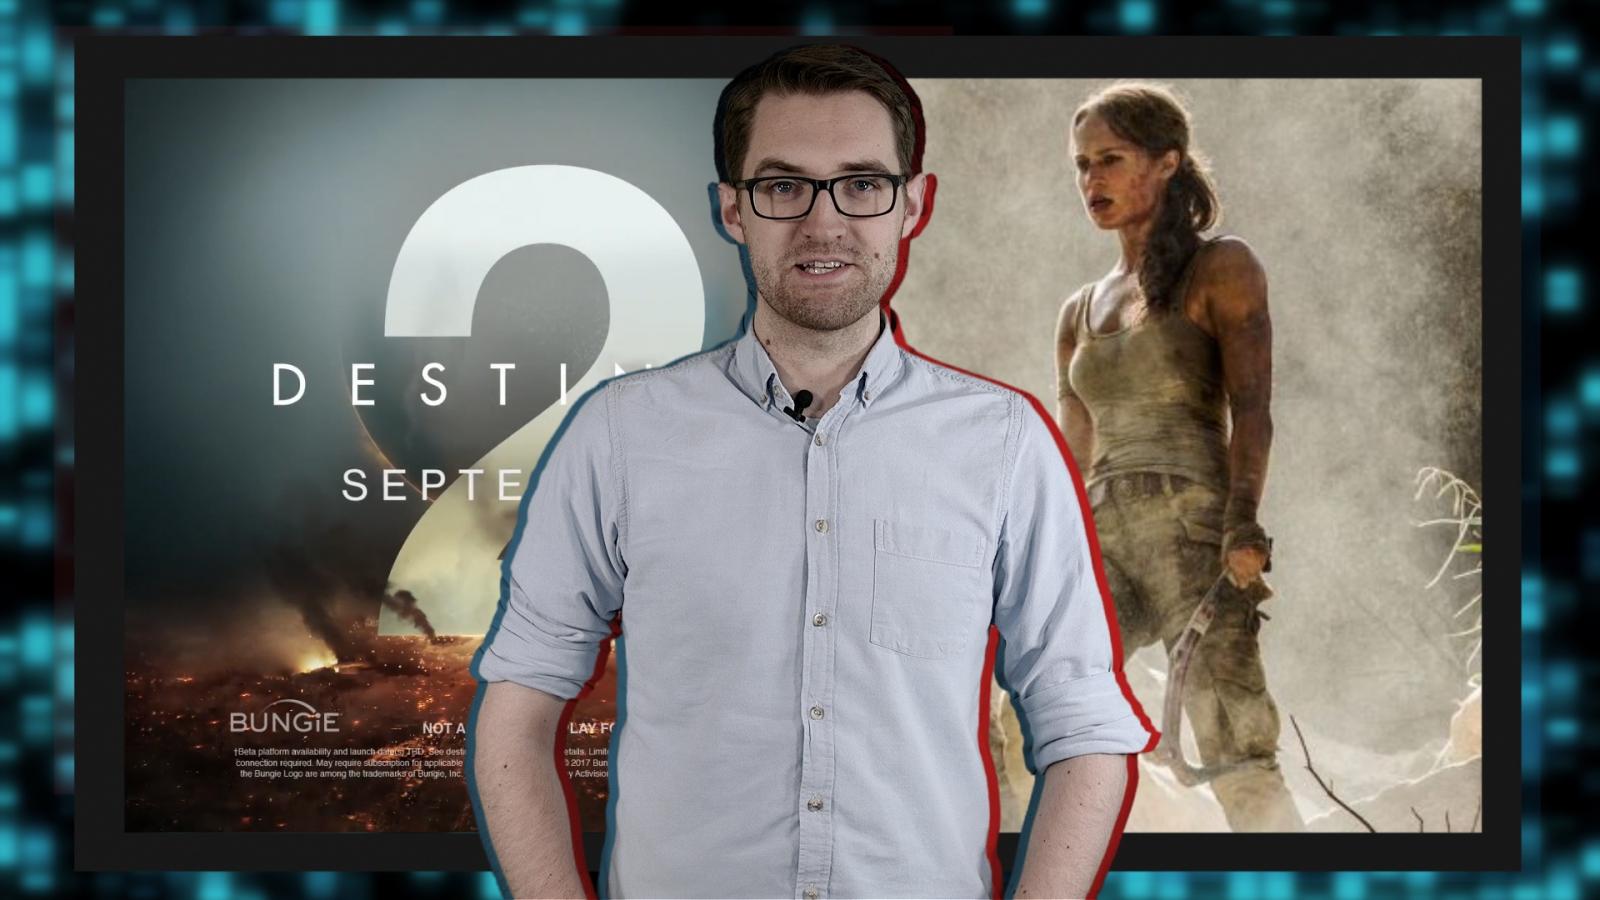 Video game news round-up: Destiny 2 revealed, Dota 2 TI7 dated and Alicia Vikander as Lara Croft